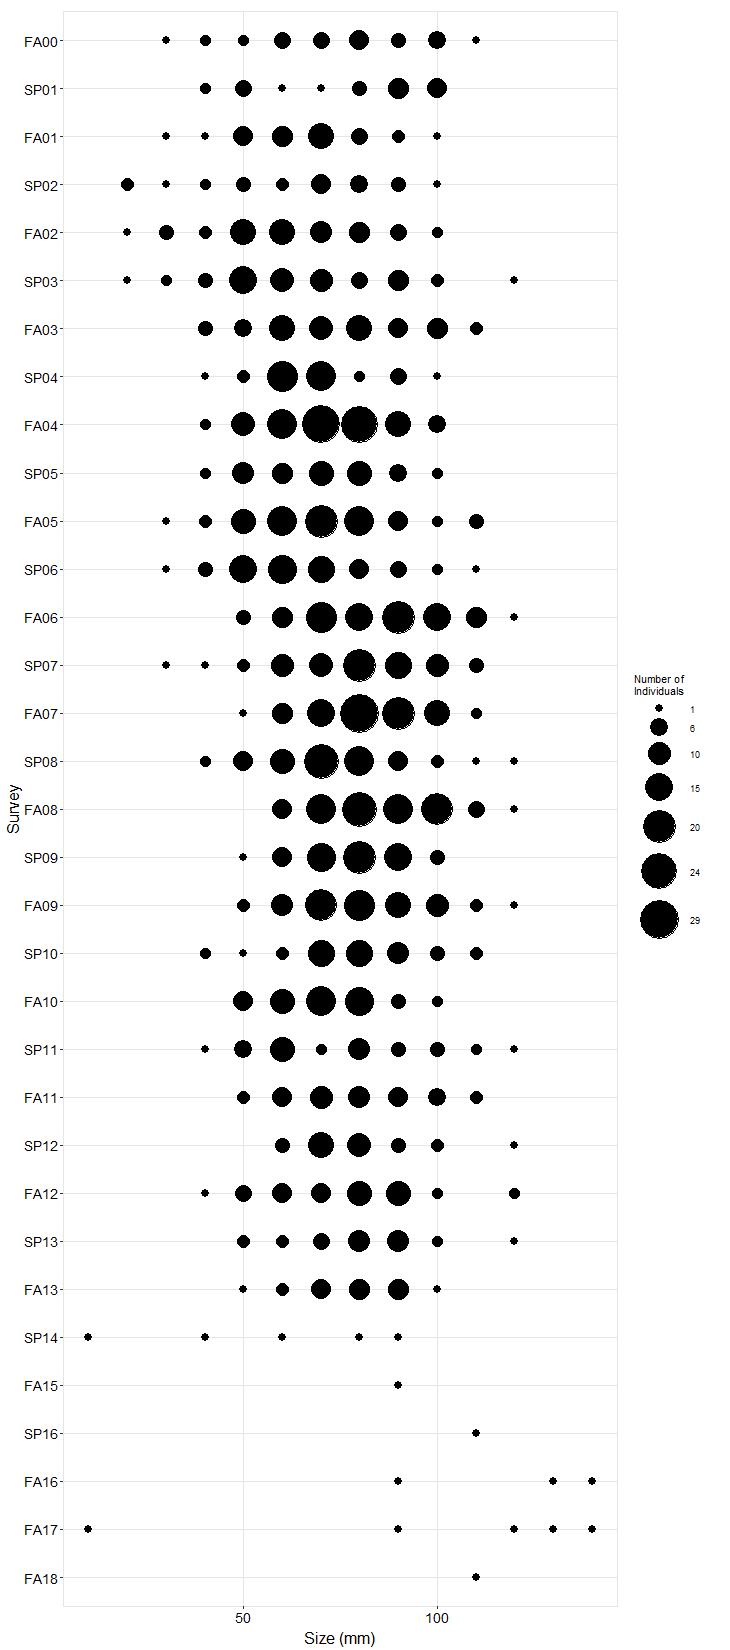 Cayucos Pisaster size plot